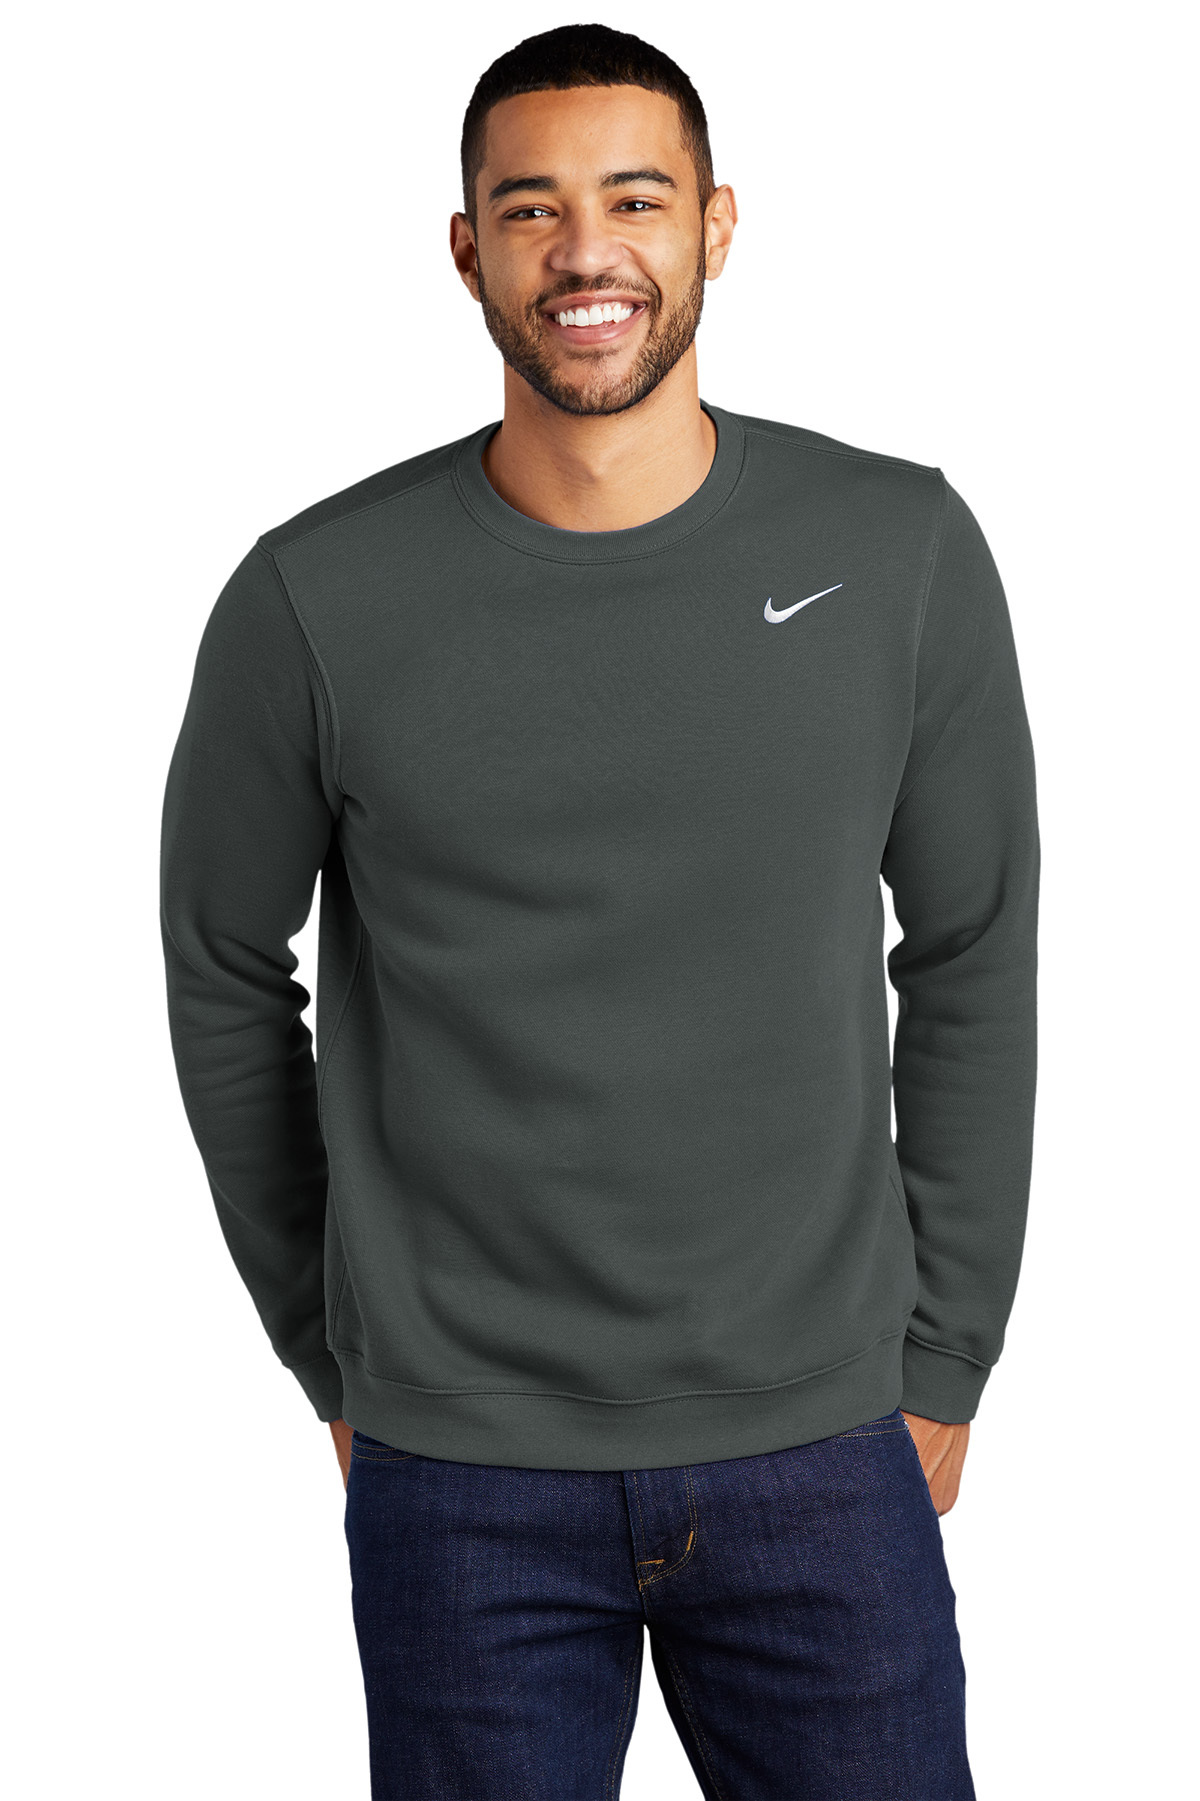 martes ex Respeto a ti mismo  Nike Club Fleece Crew   Crewnecks   Sweatshirts/Fleece   SanMar